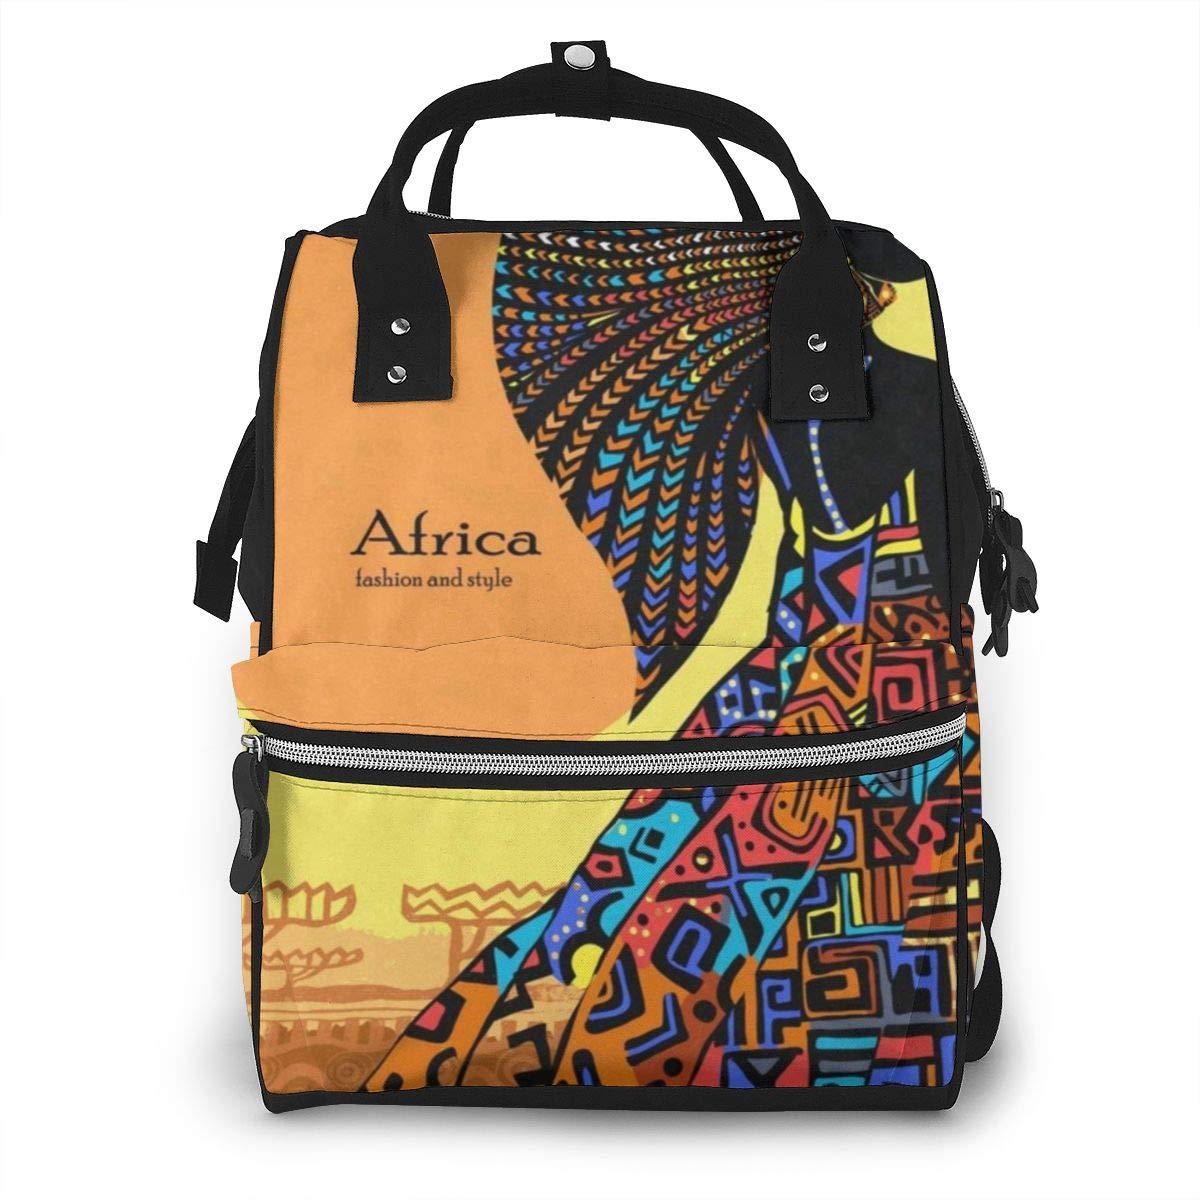 Diaper Backpack Multifunction Mom Dad Bag,Large Capacity Insulated Waterproof